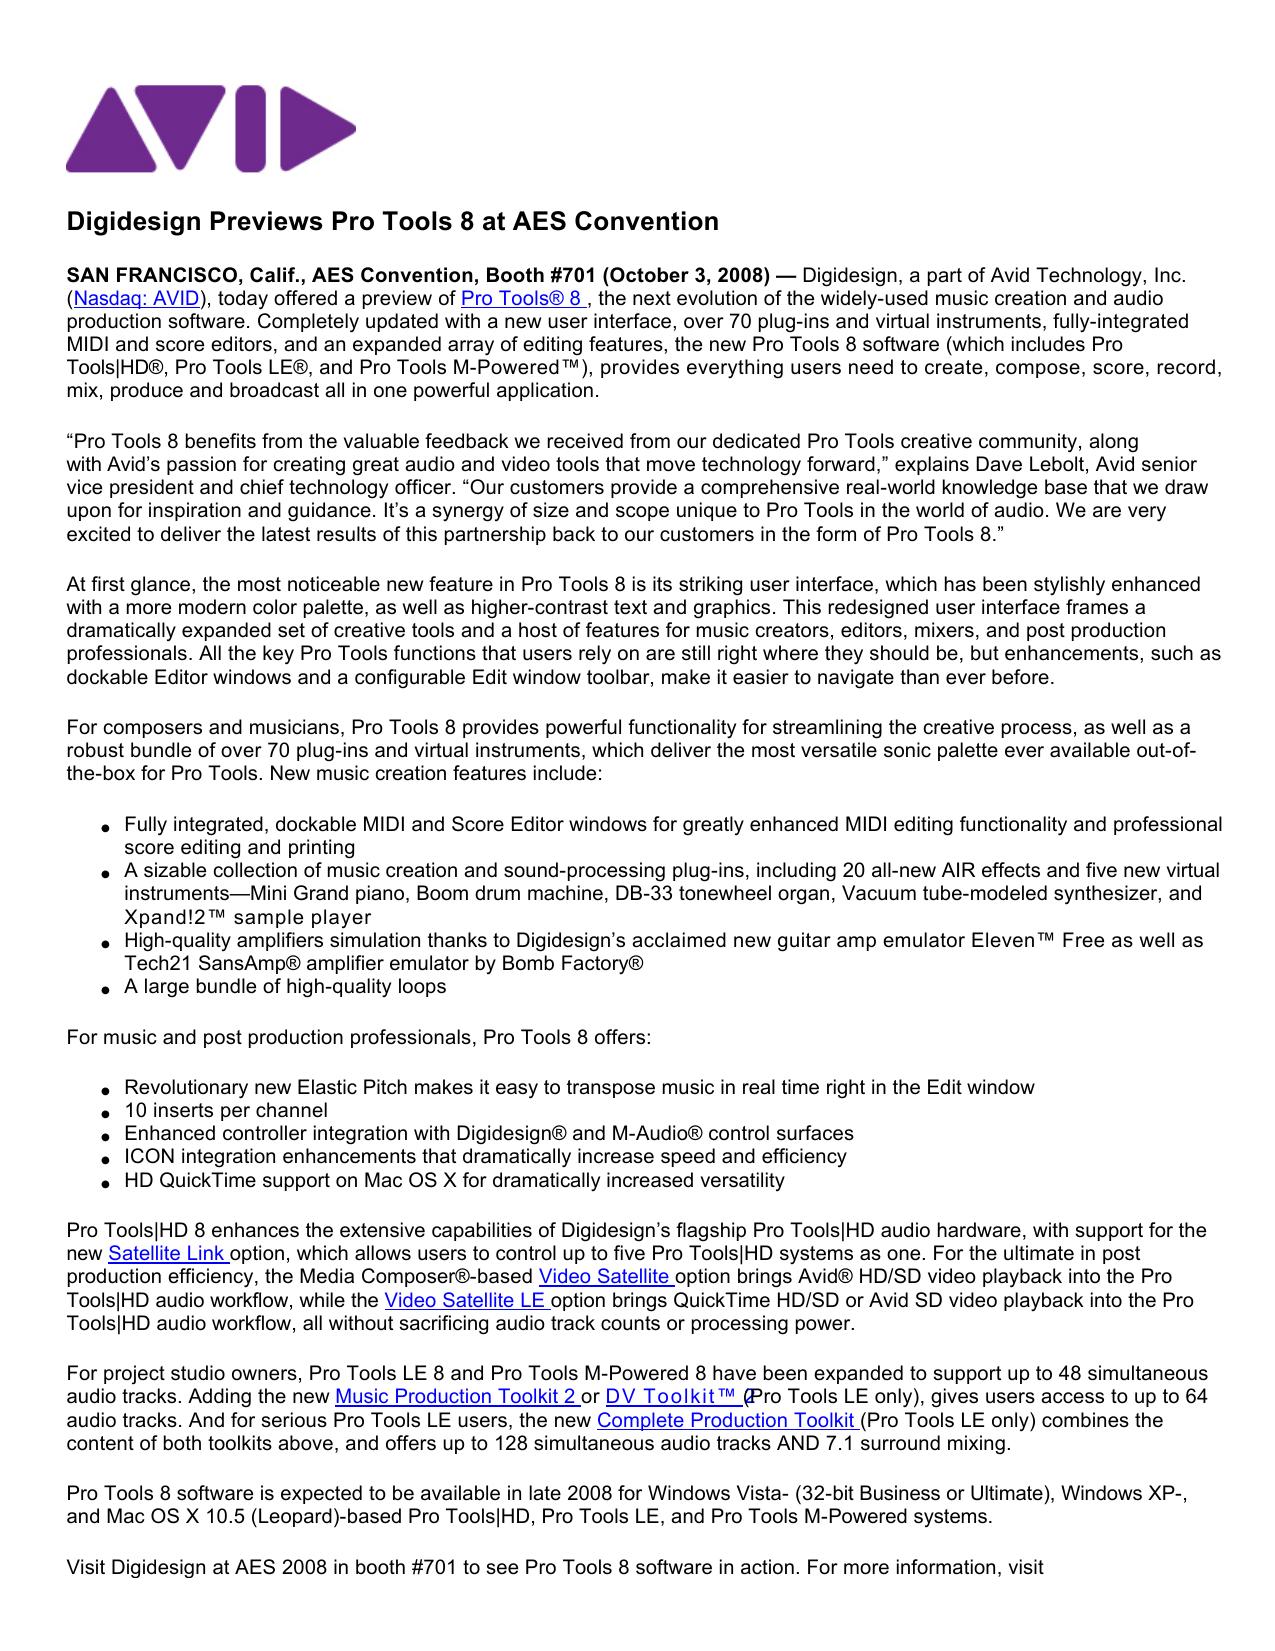 Digidesign Previews Pro Tools 8 at AES Convention | manualzz com